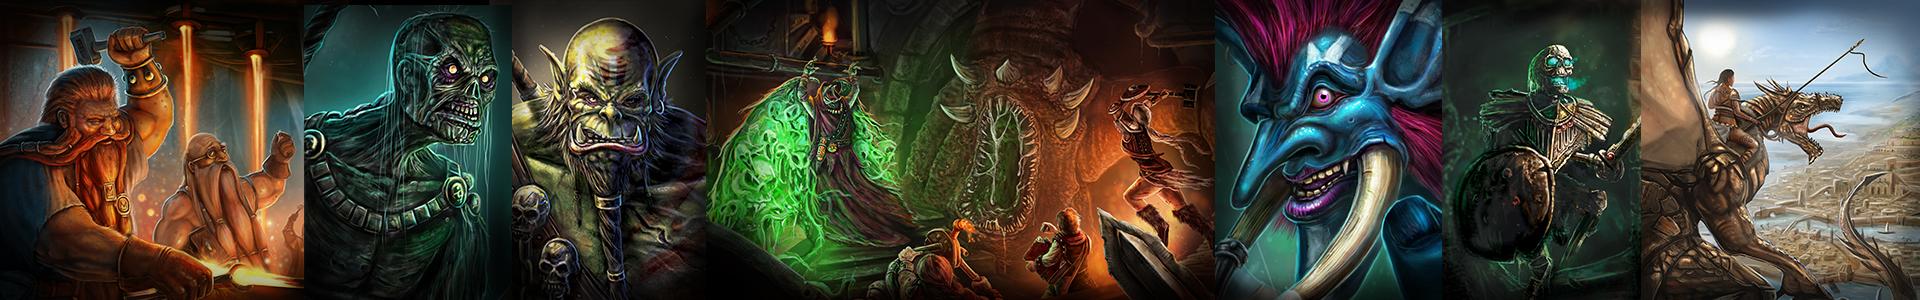 fantasy art banner of work from The Noble Artist